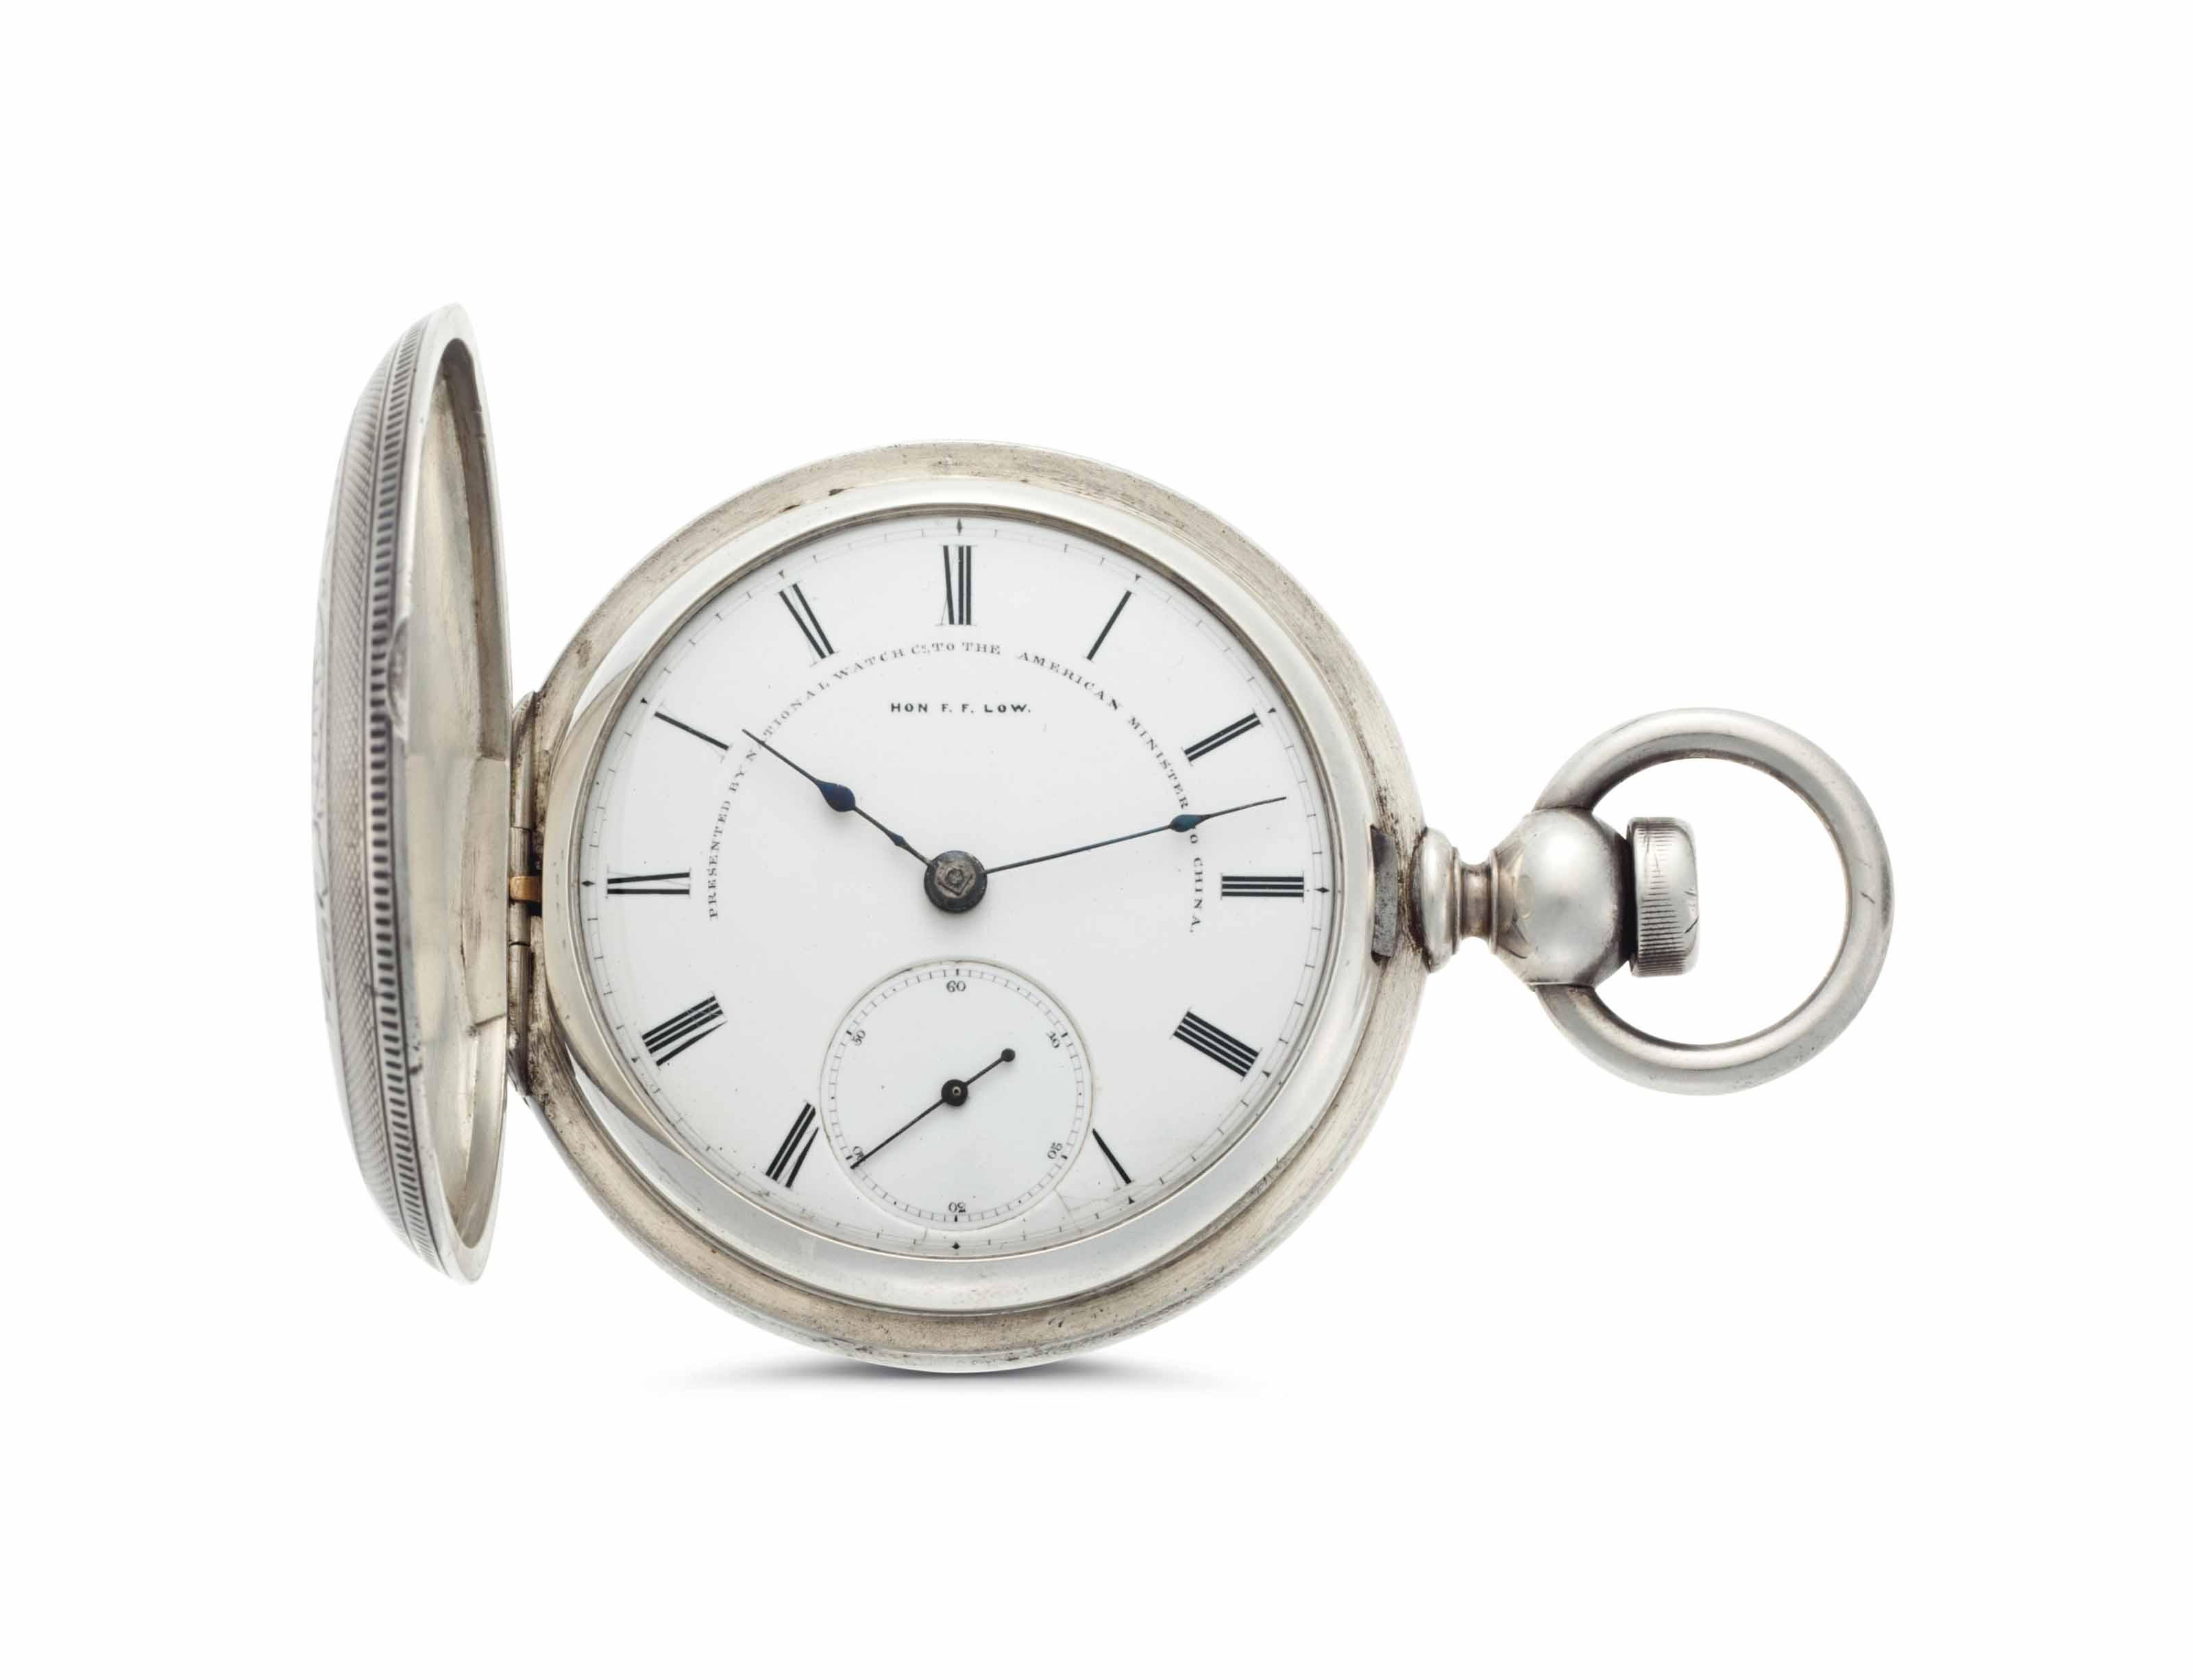 Elgin National Watch Co. A Rar